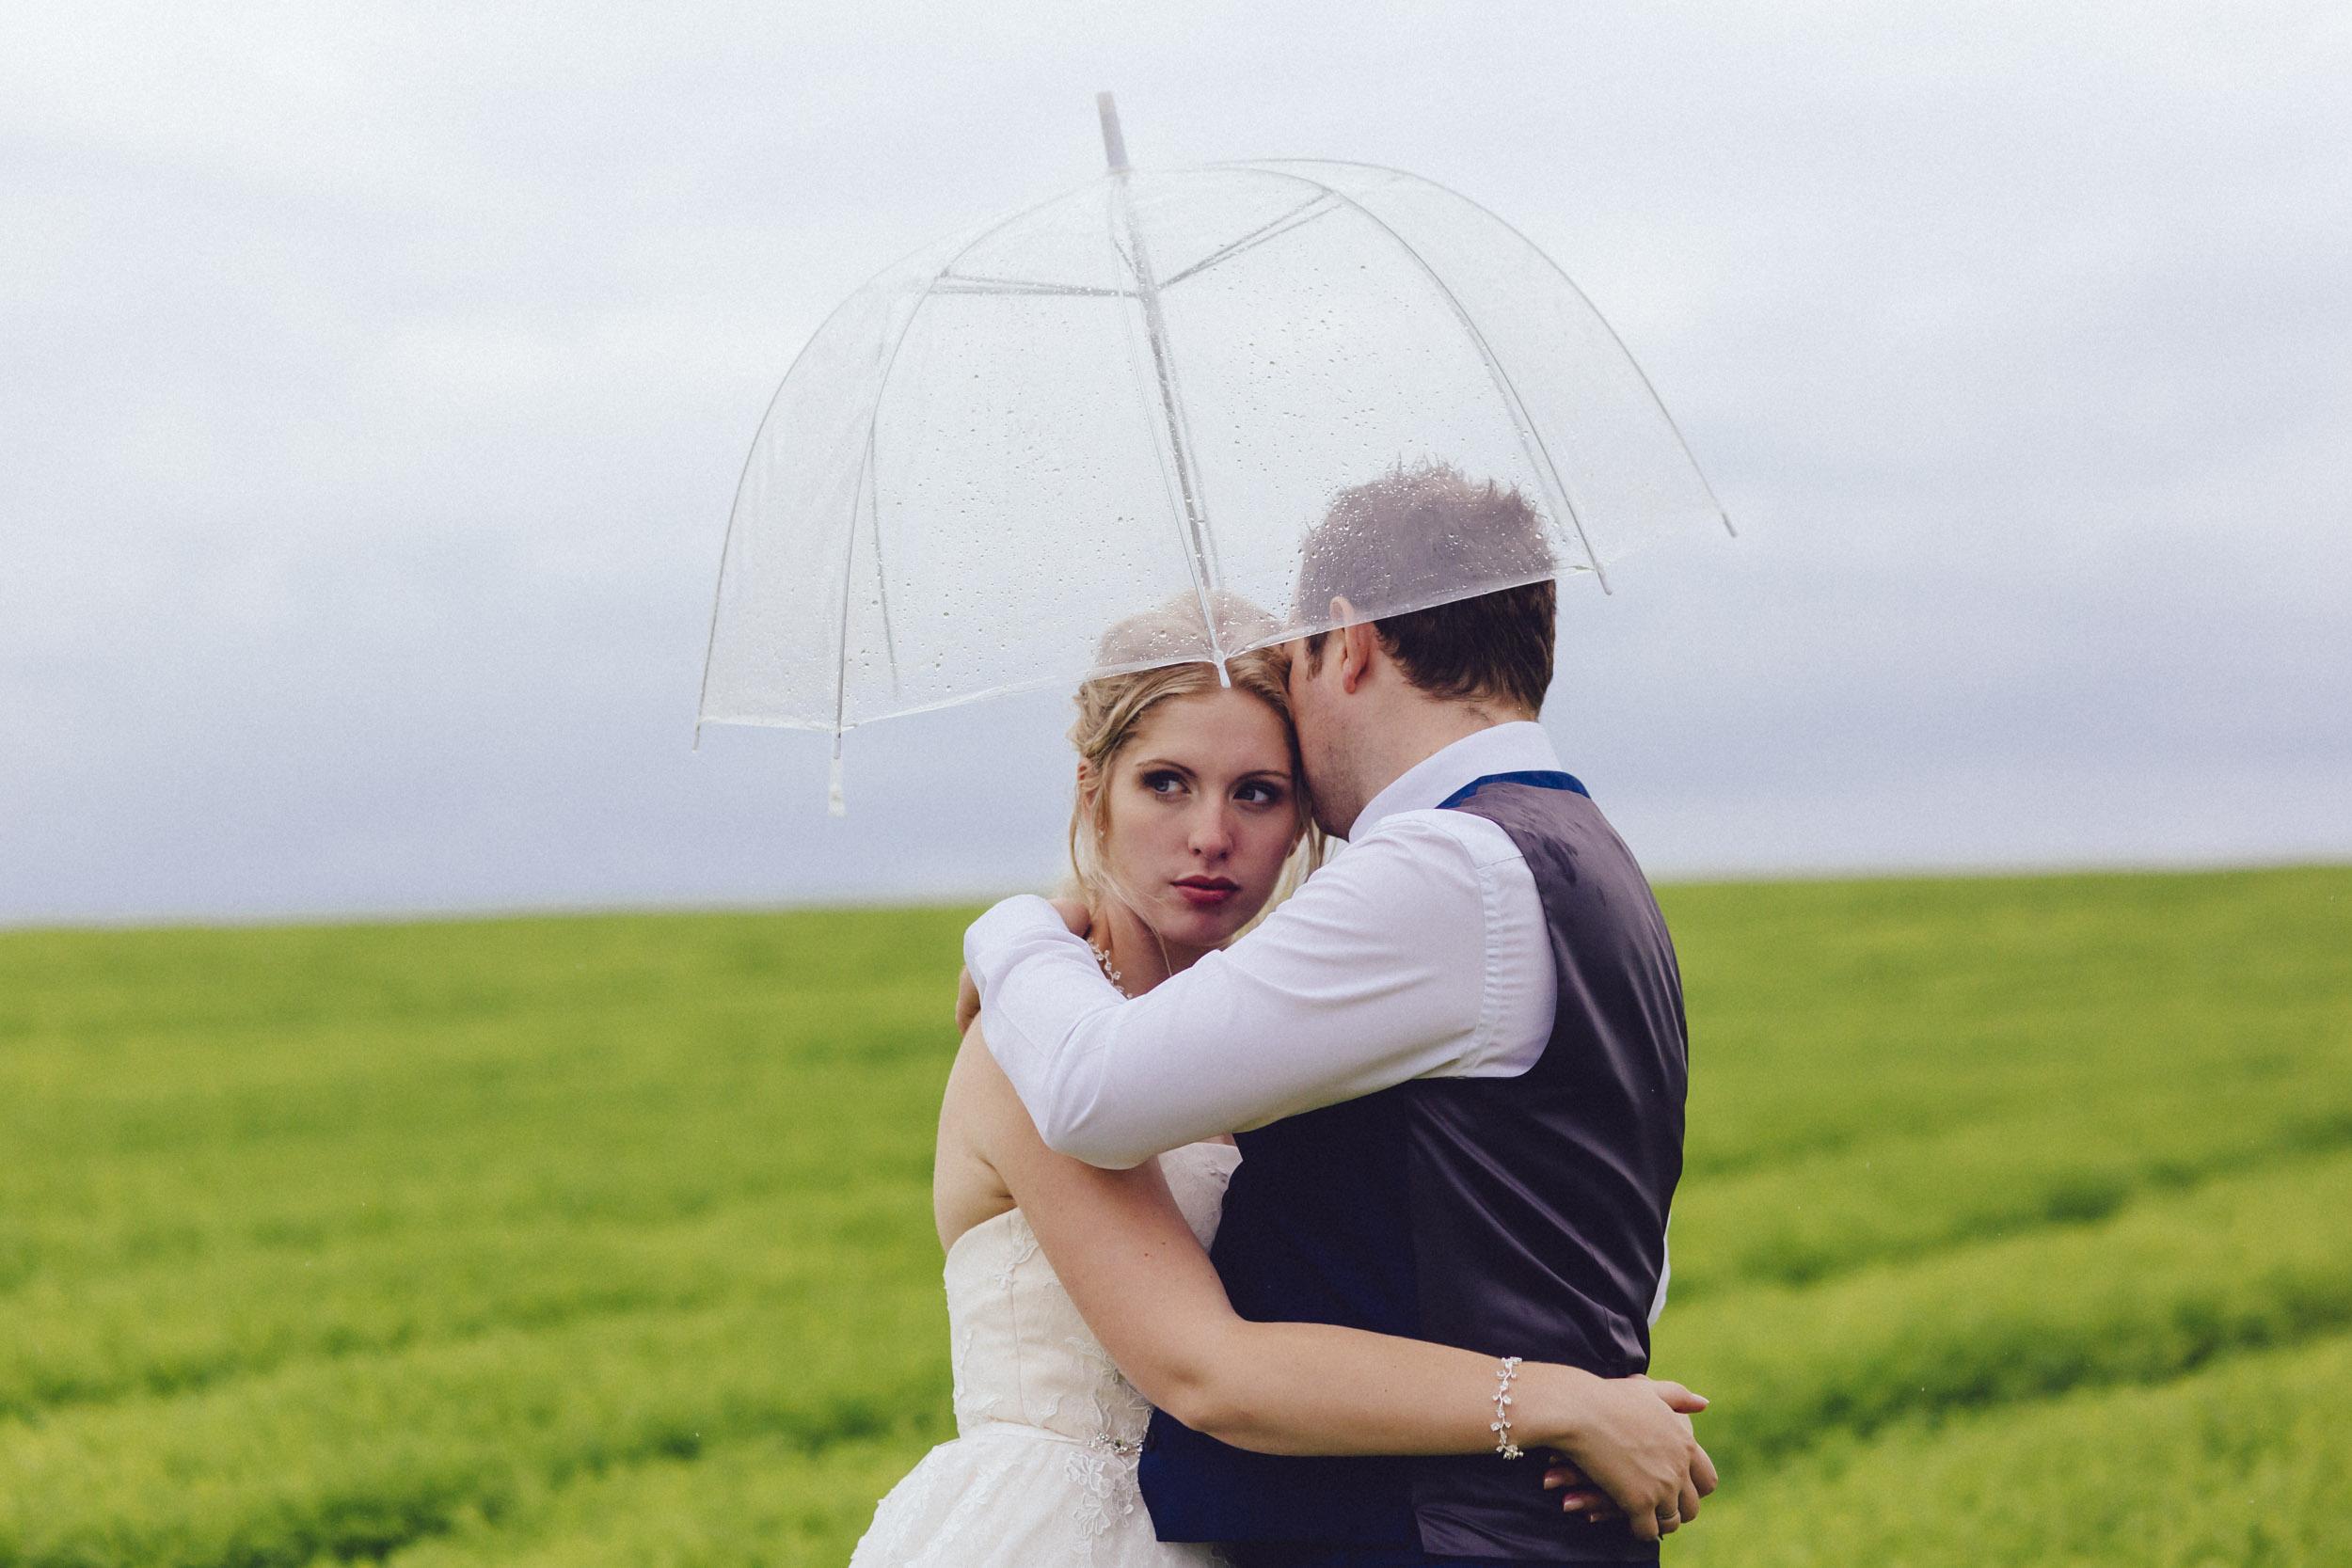 0020-Birmingham Wedding photographer-Creative wedding photographer- artistic wedding photography-digbeth wedding photographer-Tipi Wedding-.jpg